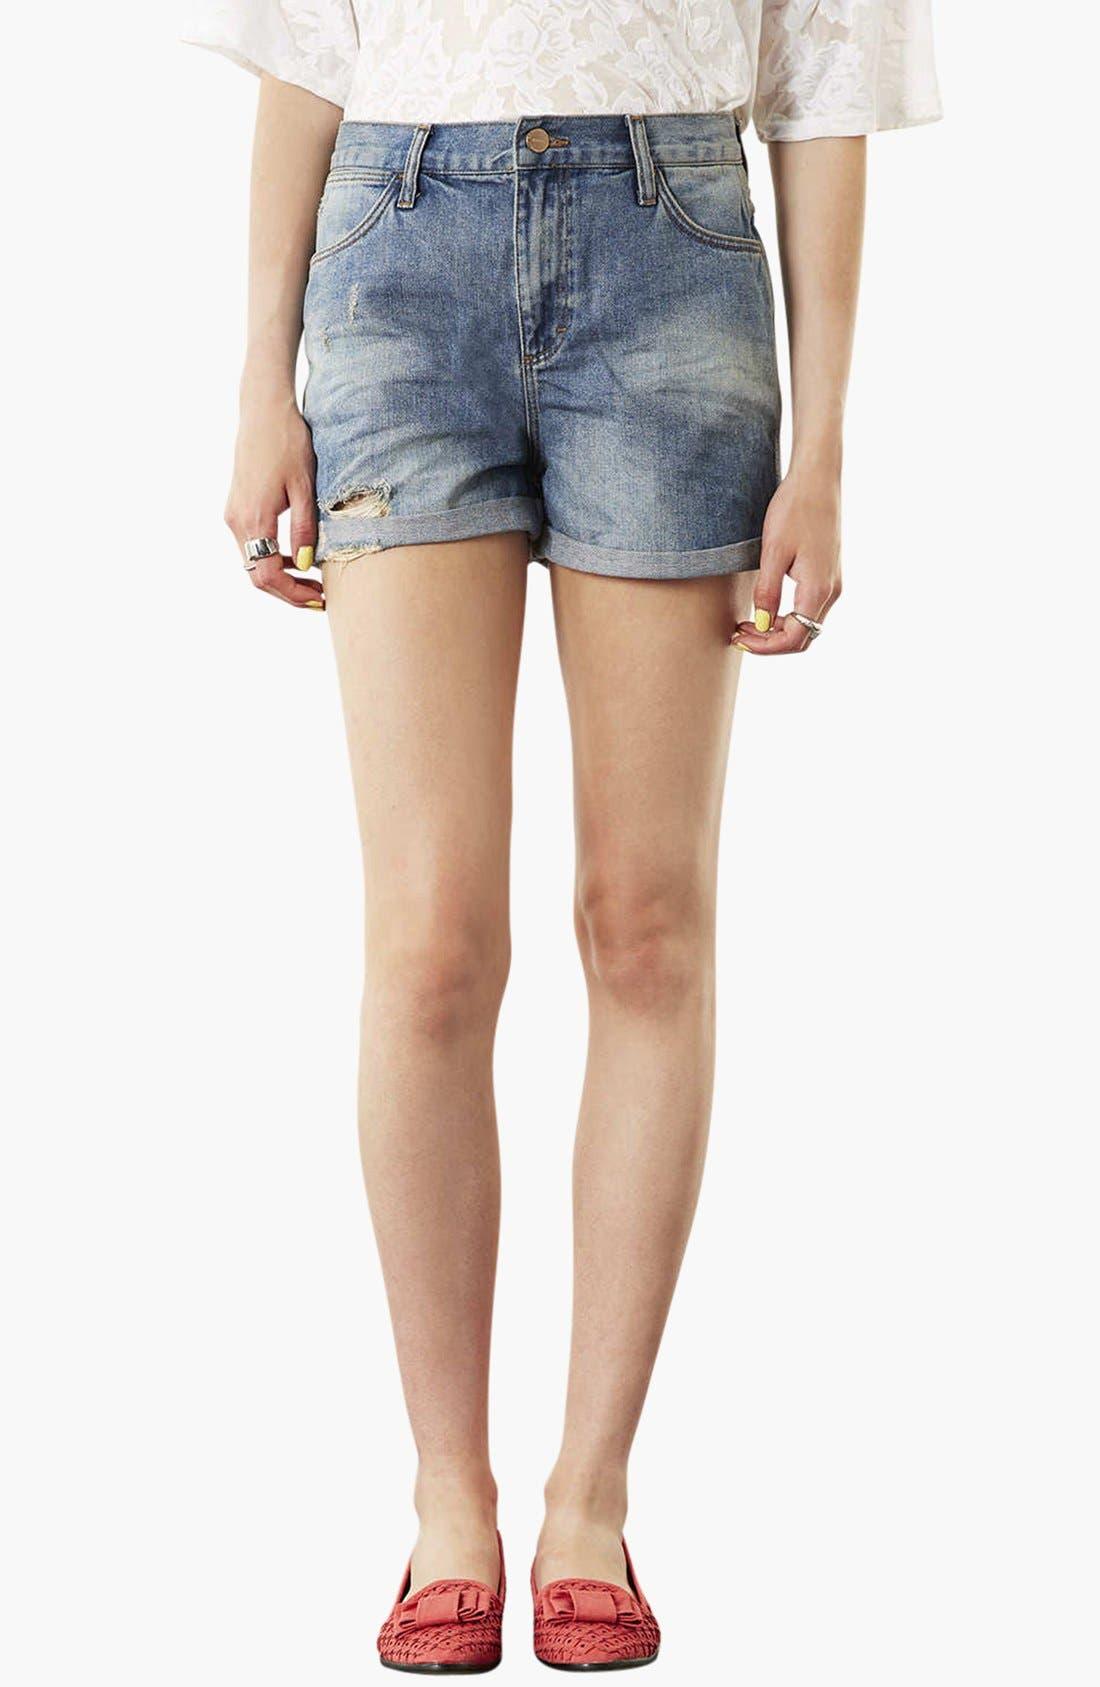 Alternate Image 1 Selected - Topshop Moto 'Dirty Boy' Distressed Denim Shorts